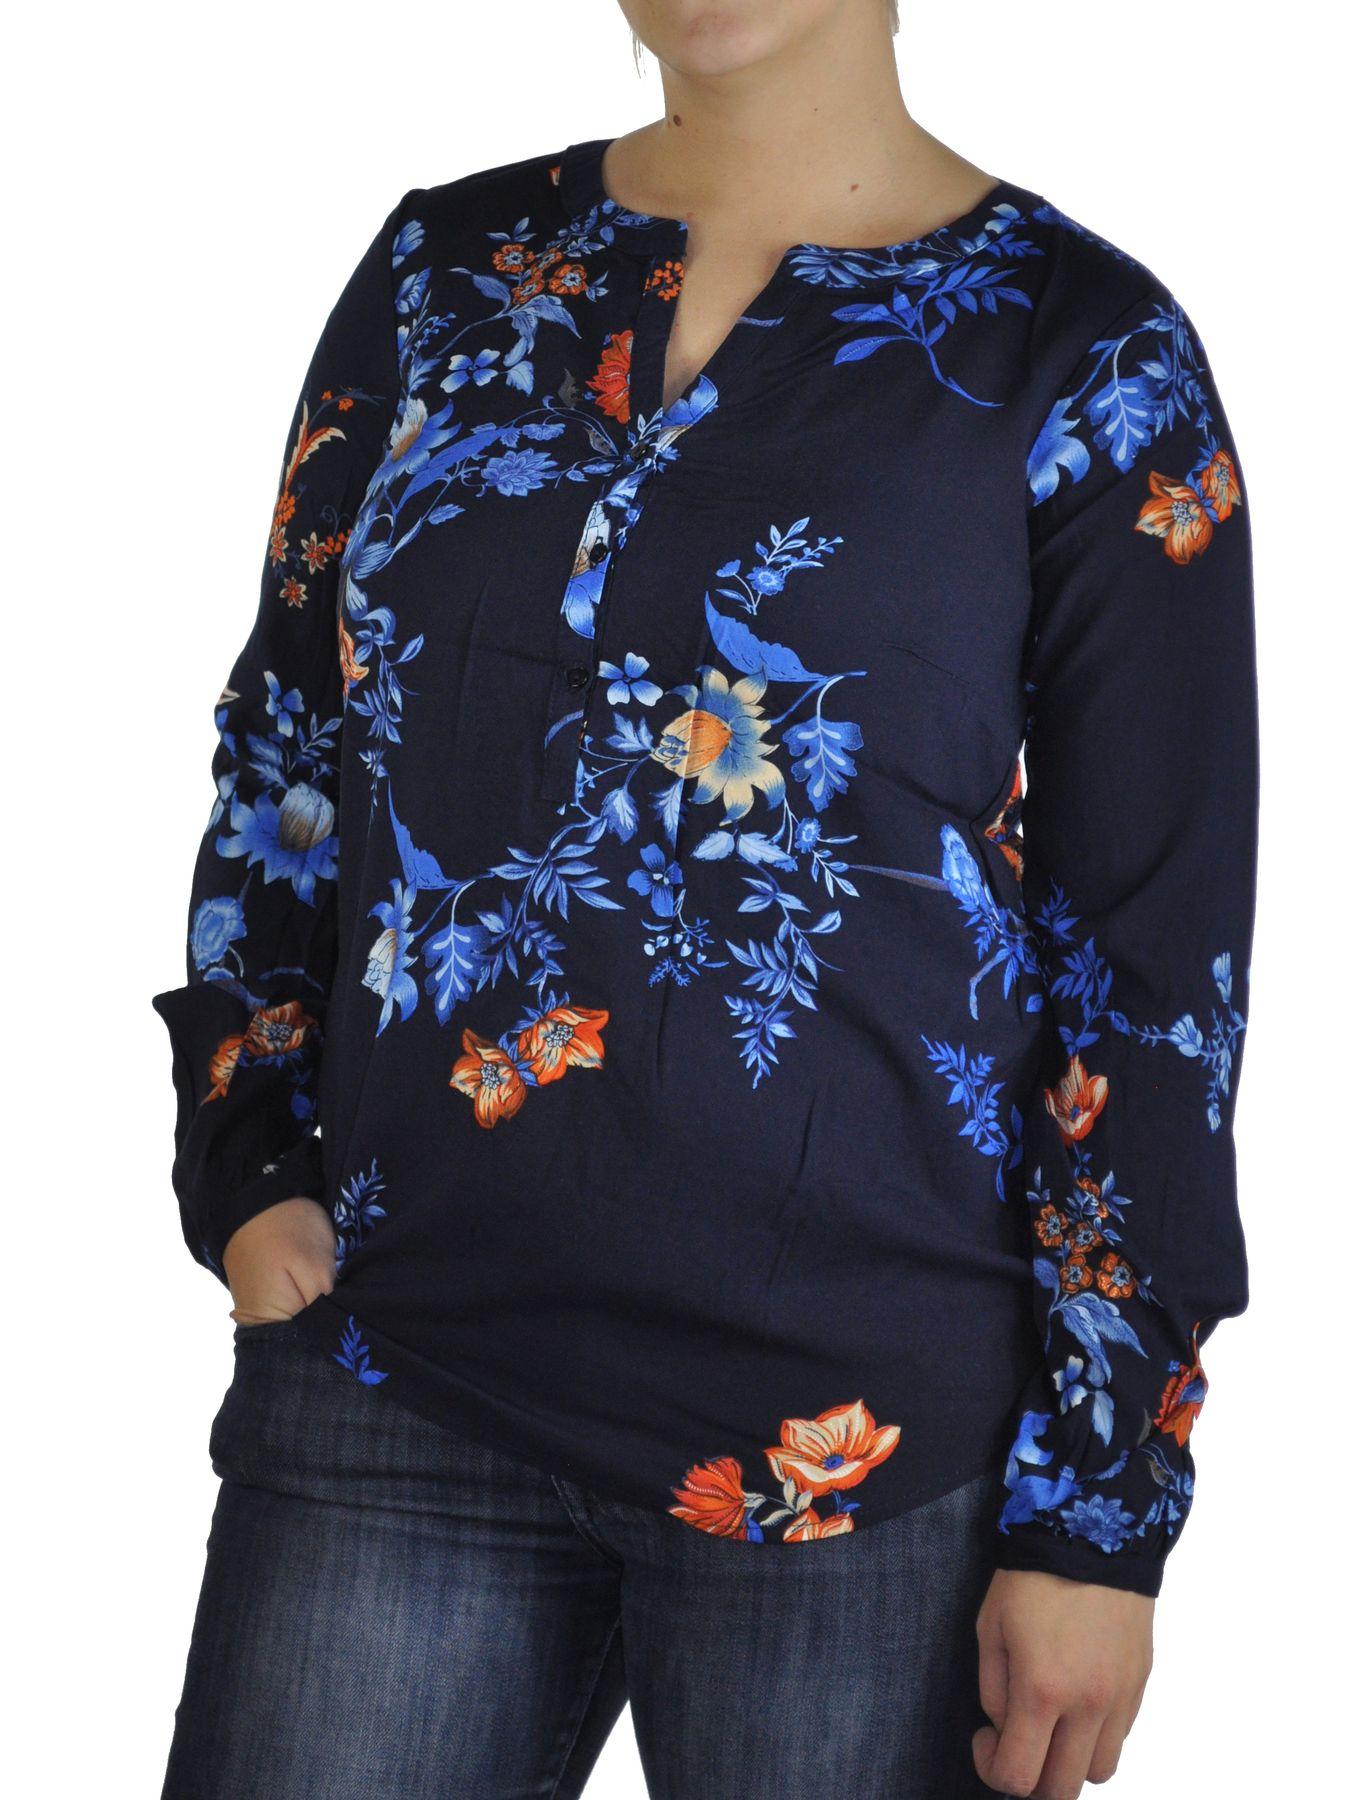 Soyaconcept - Damen Bluse in verschiedenen Farben, SC-Paola 2 (14640-30)